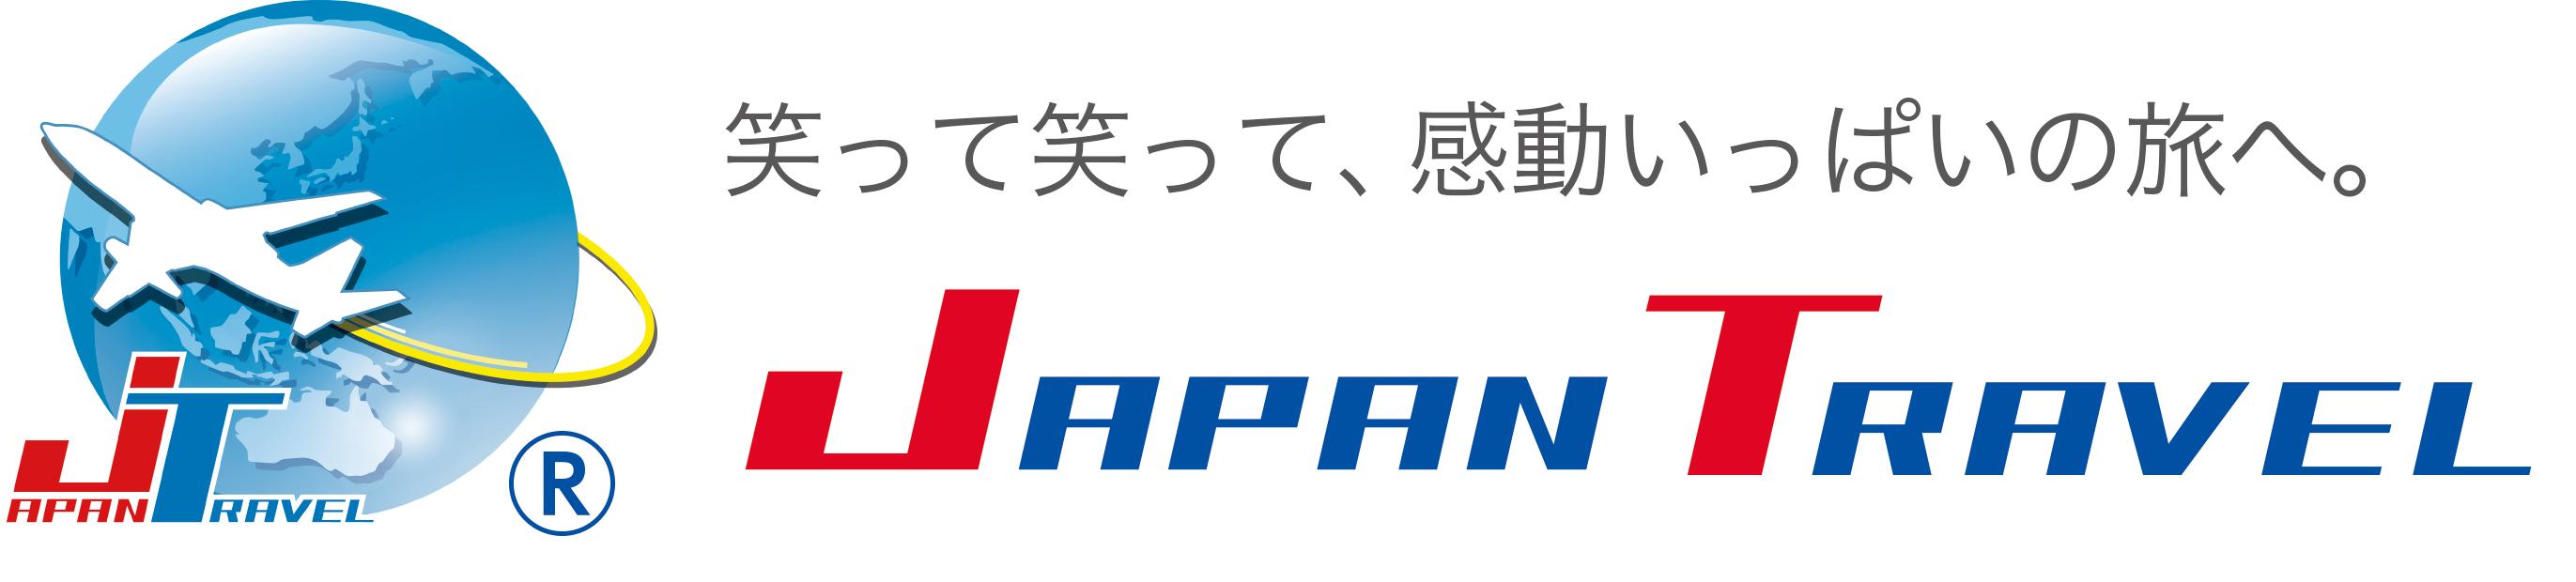 JapanTravelのオンラインバスツアー